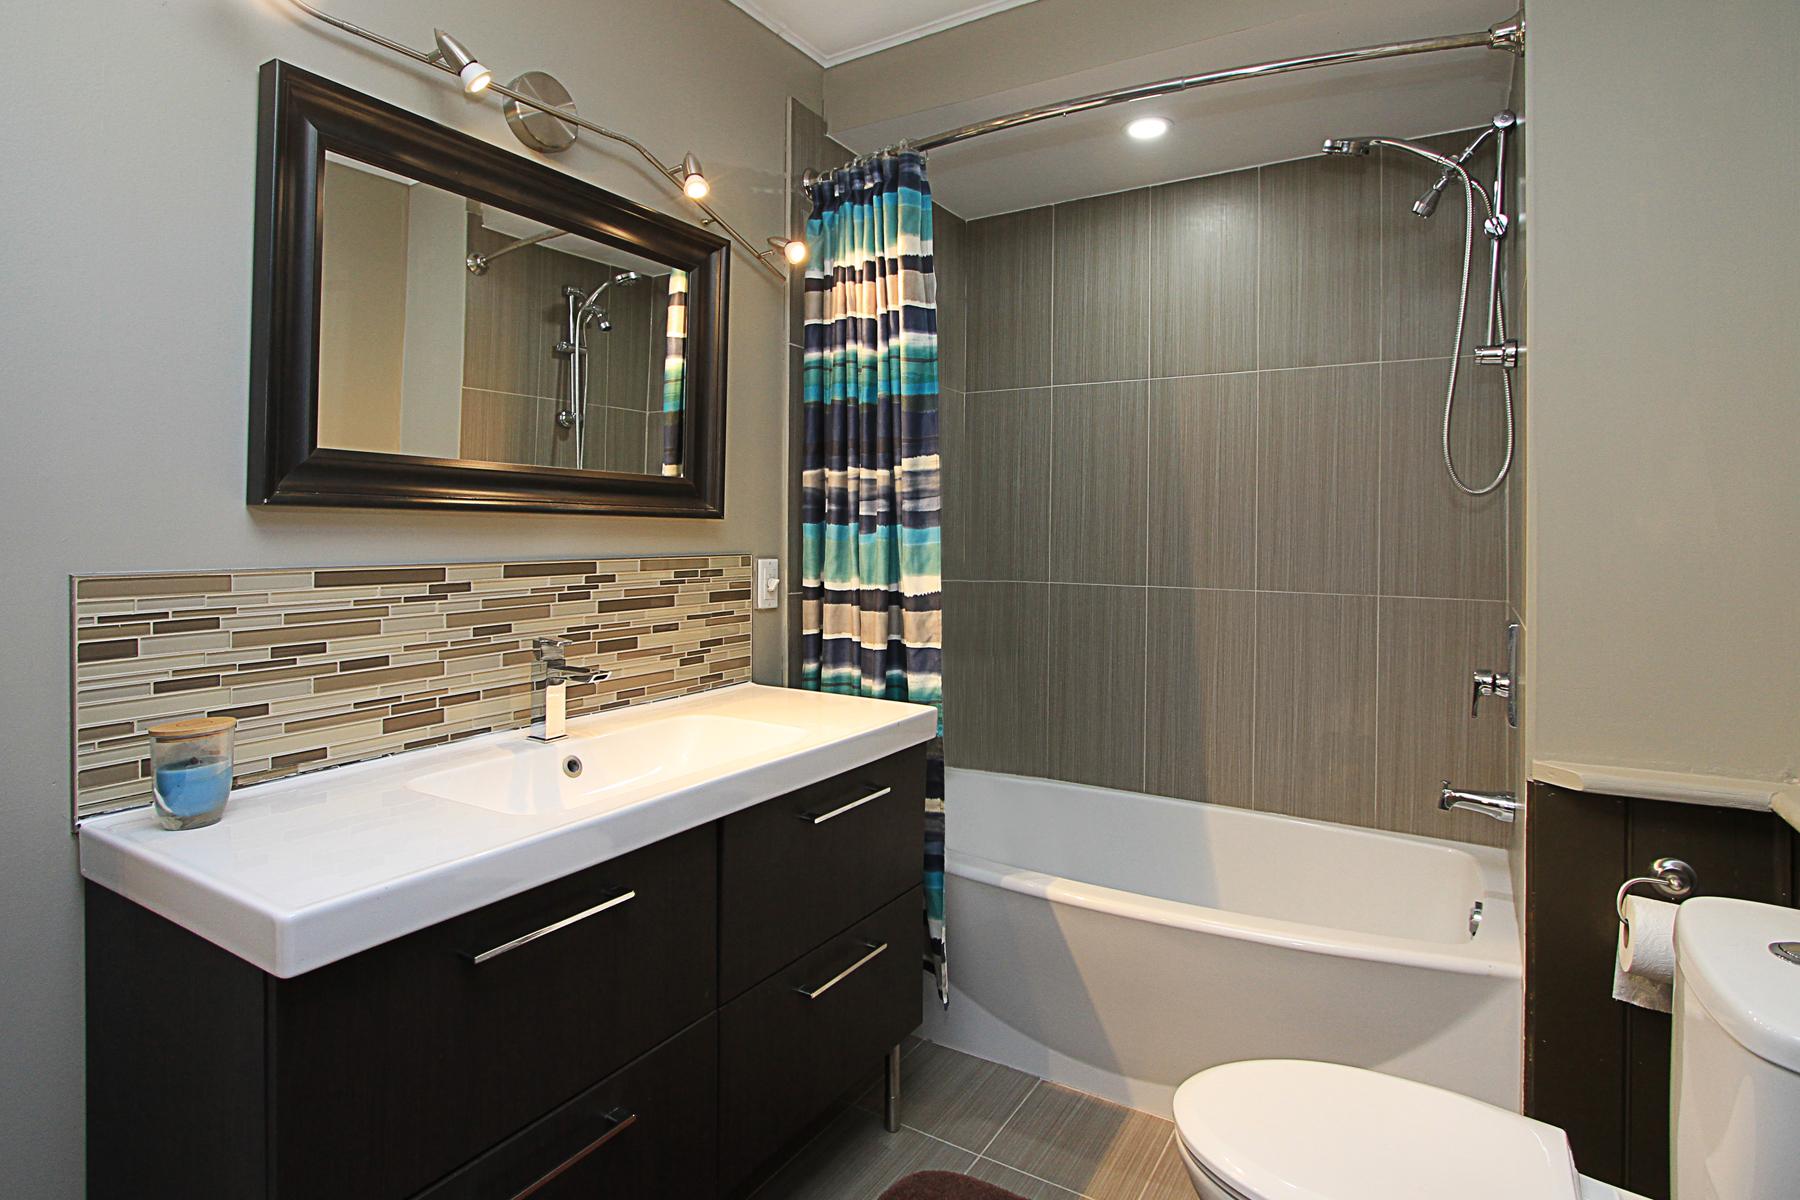 Sample bathroom photo by Paula Kennedy of Purple Door Creative